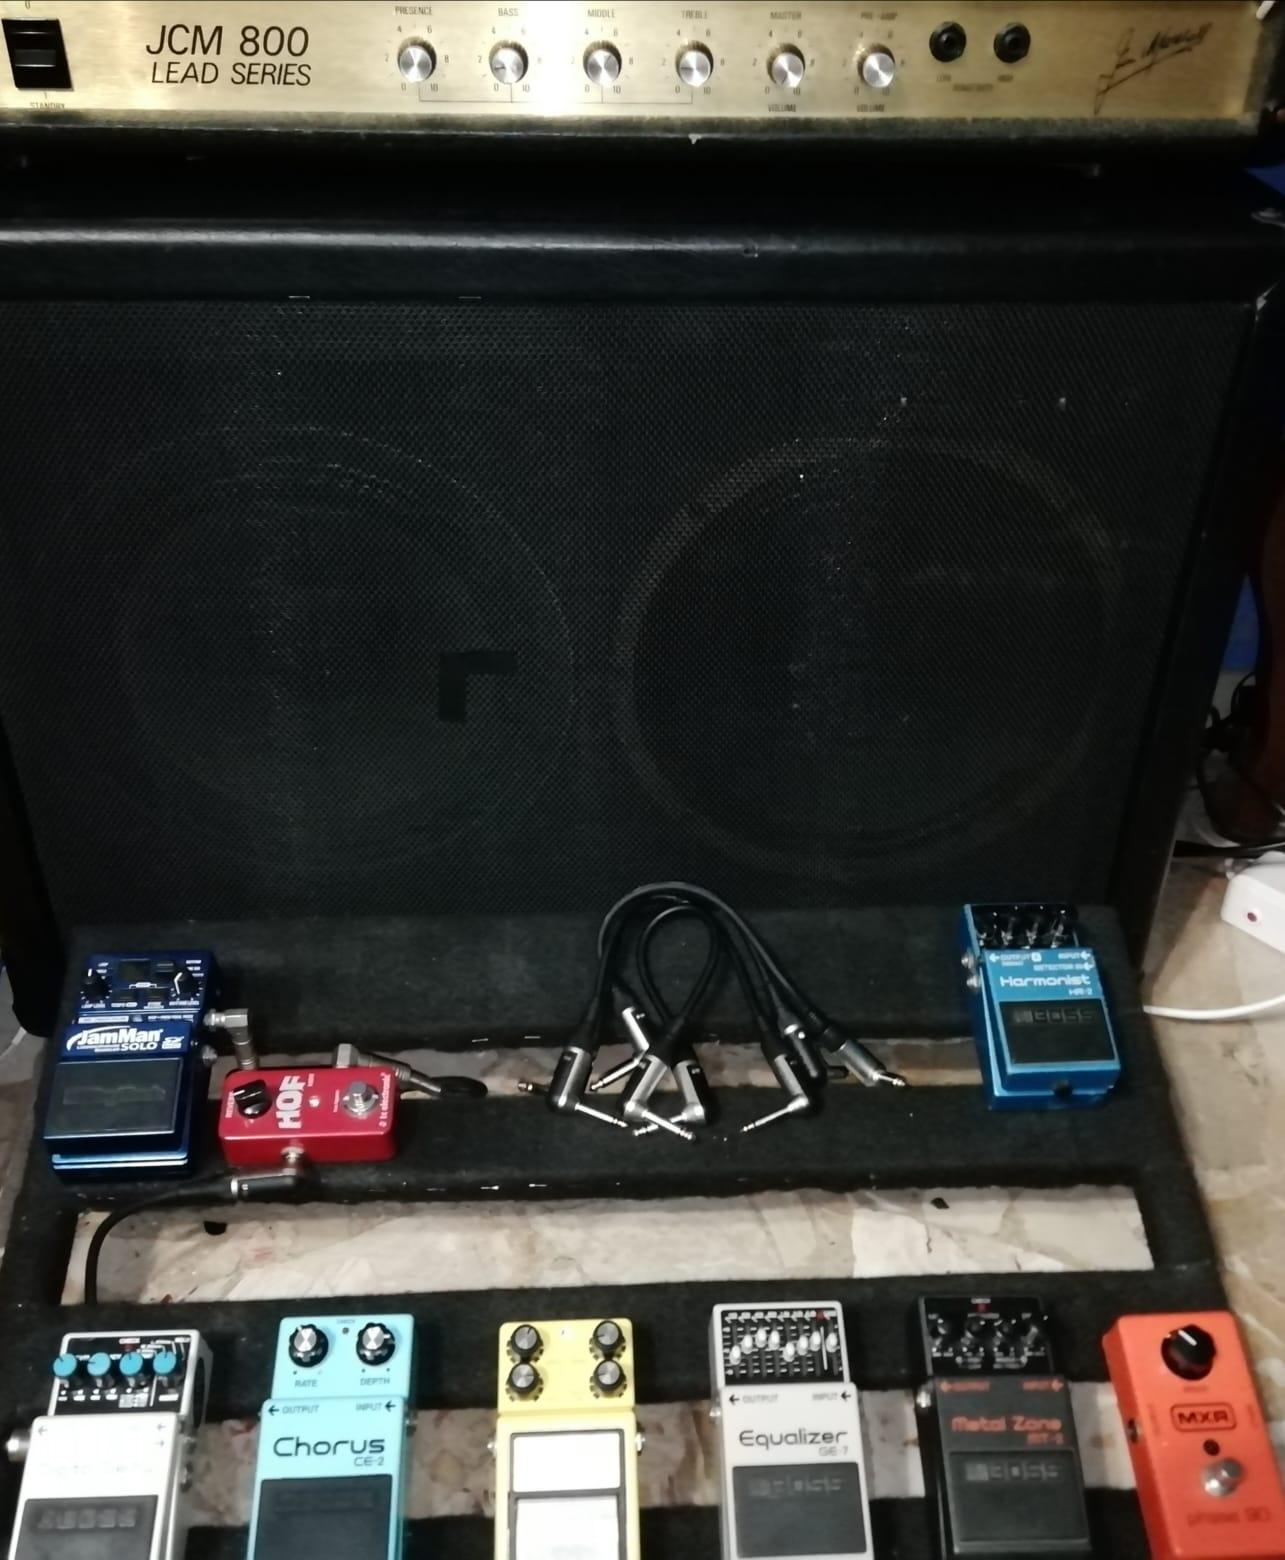 Rumore pedalboard: si và di powerbank?